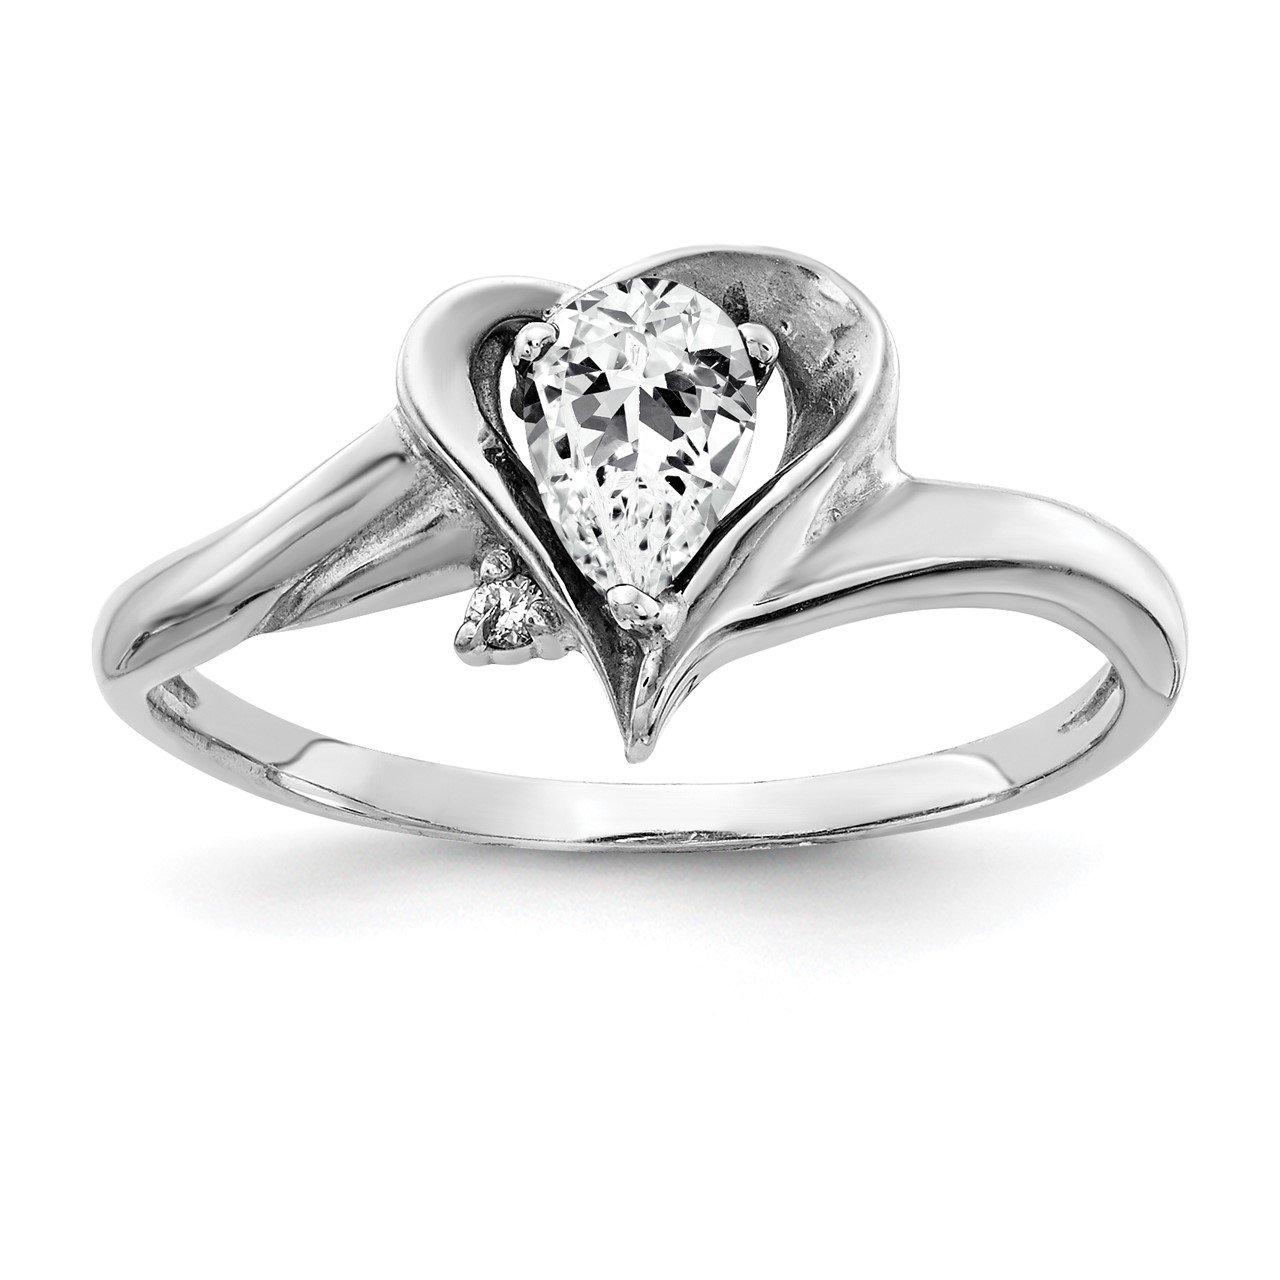 14k White Gold 6x4mm Pear Cubic Zirconia VS Diamond ring